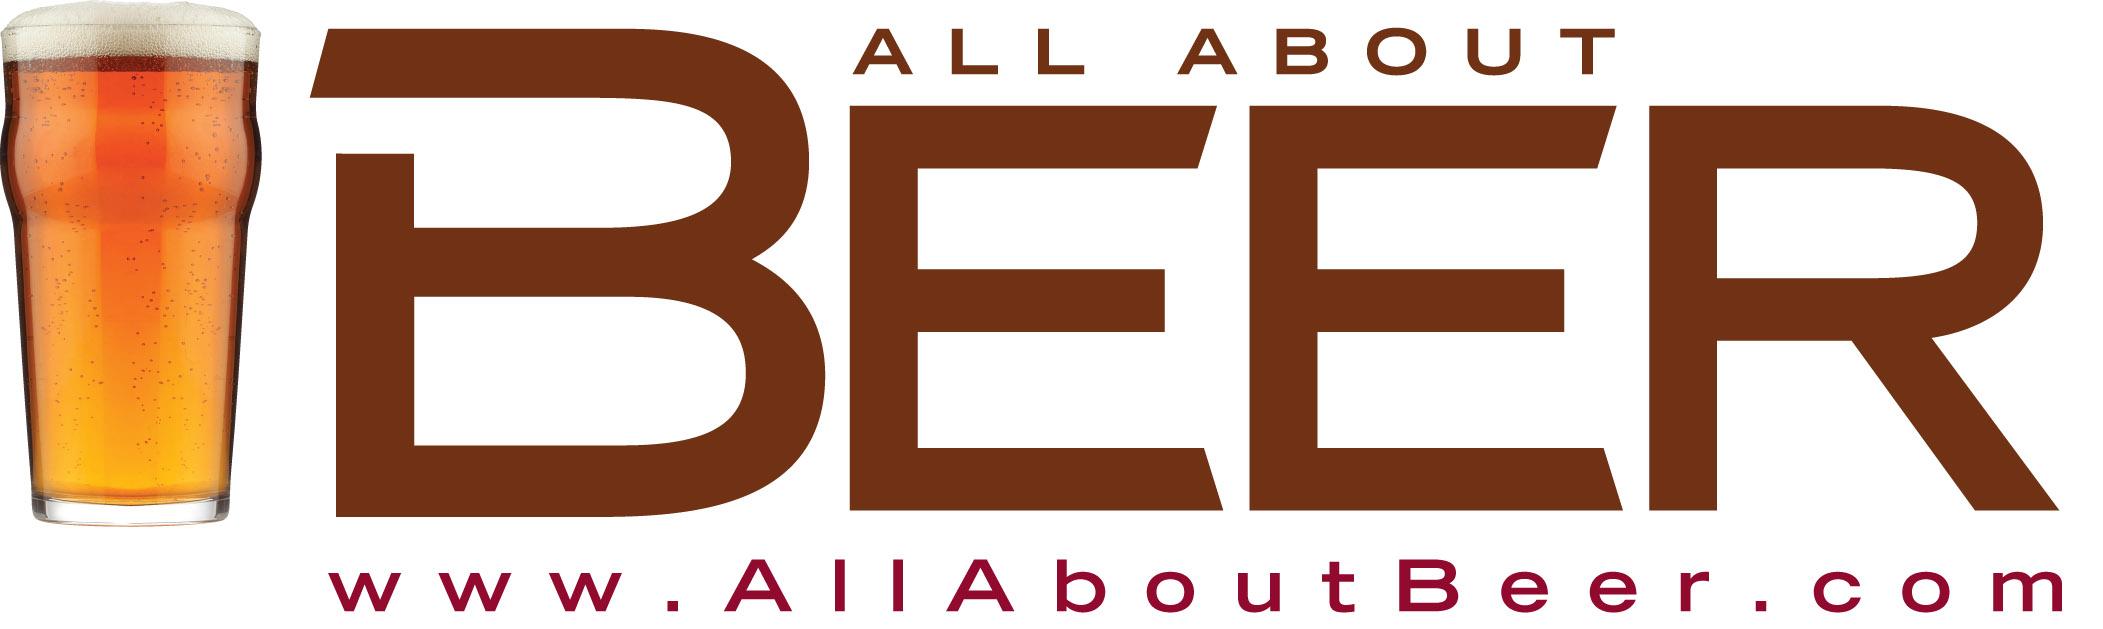 AAB logo w website.jpeg